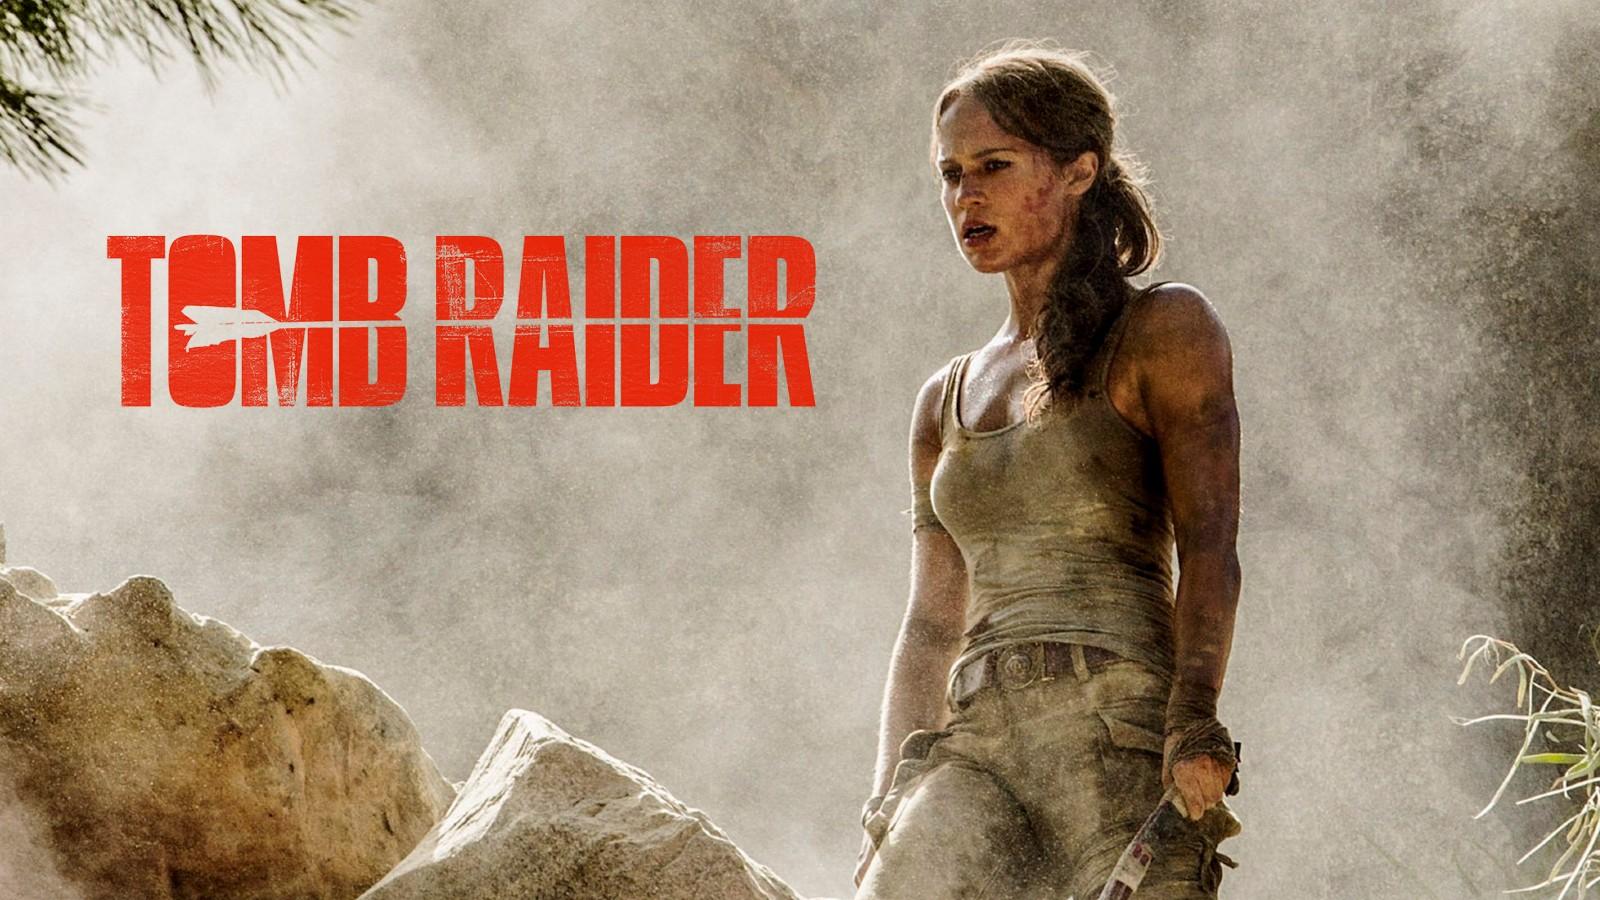 Lara Croft with the Tomb Raider logo